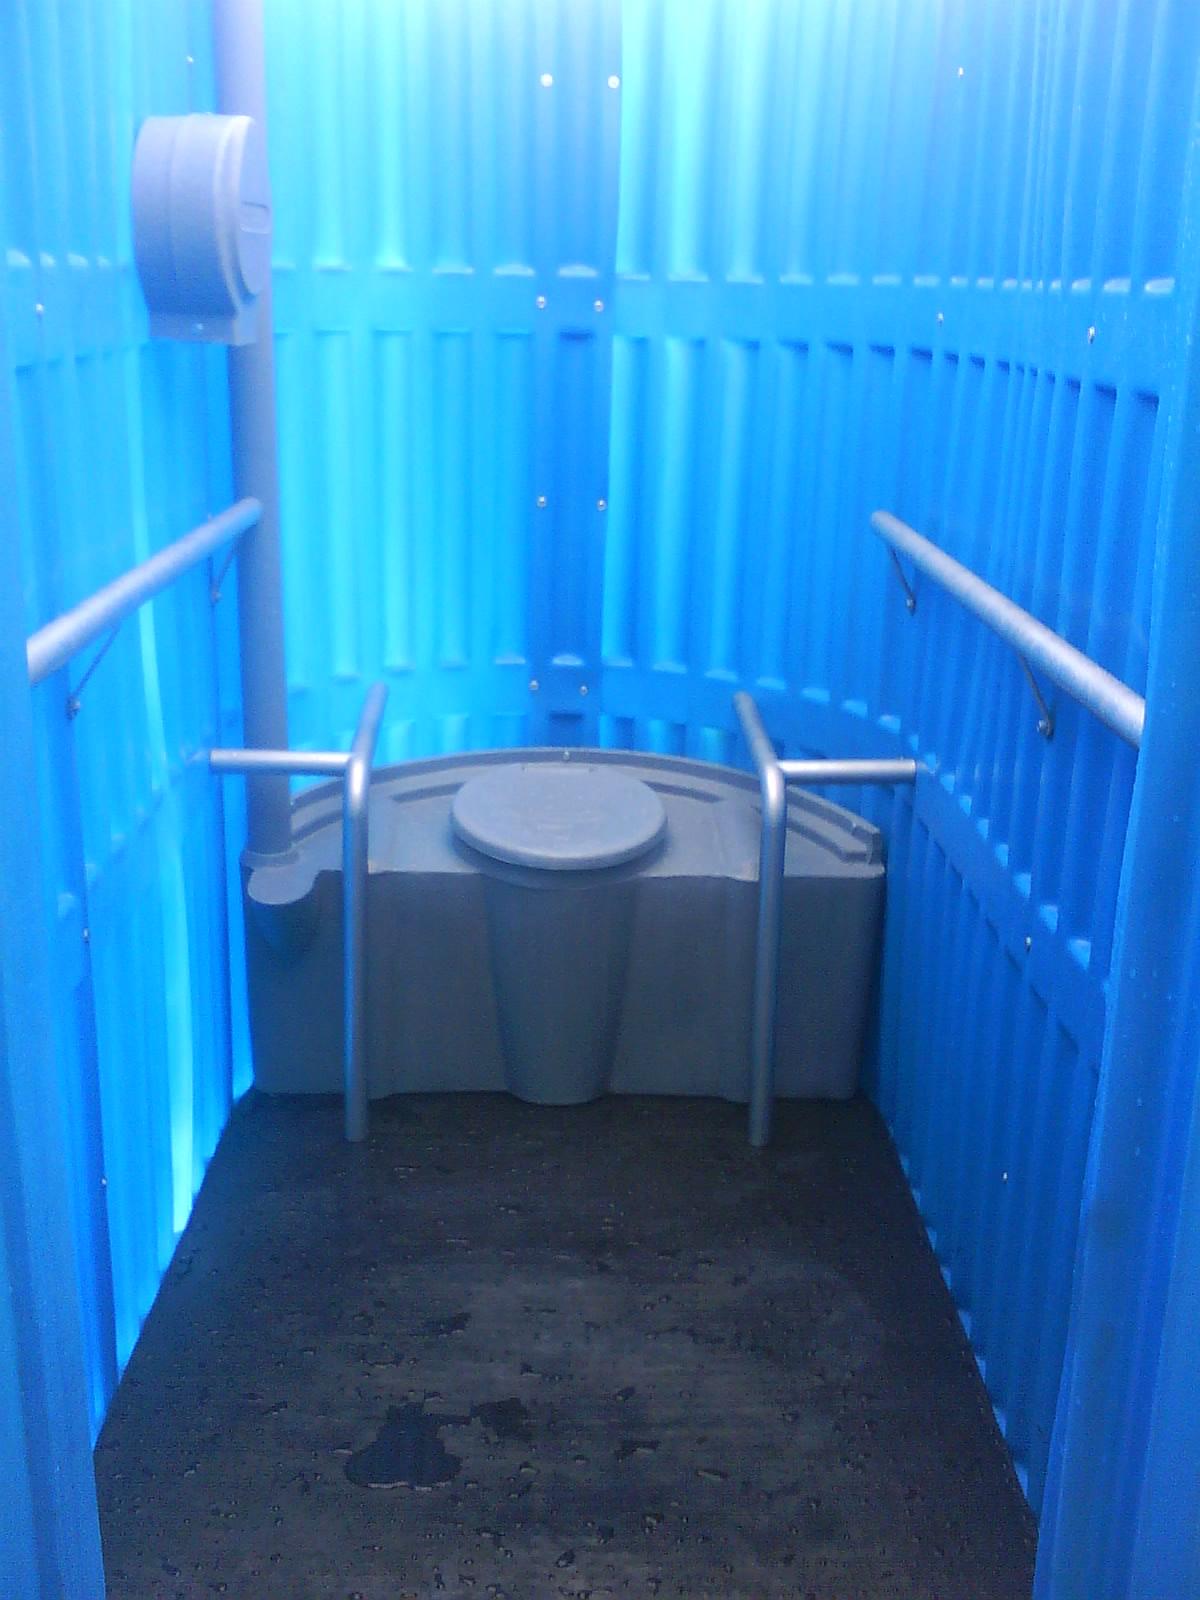 #008DCB Plastic Ambiental Indústria de Materiais Plásticos Ltda. 1200x1600 px Banheiro Ideal Ltda 3001